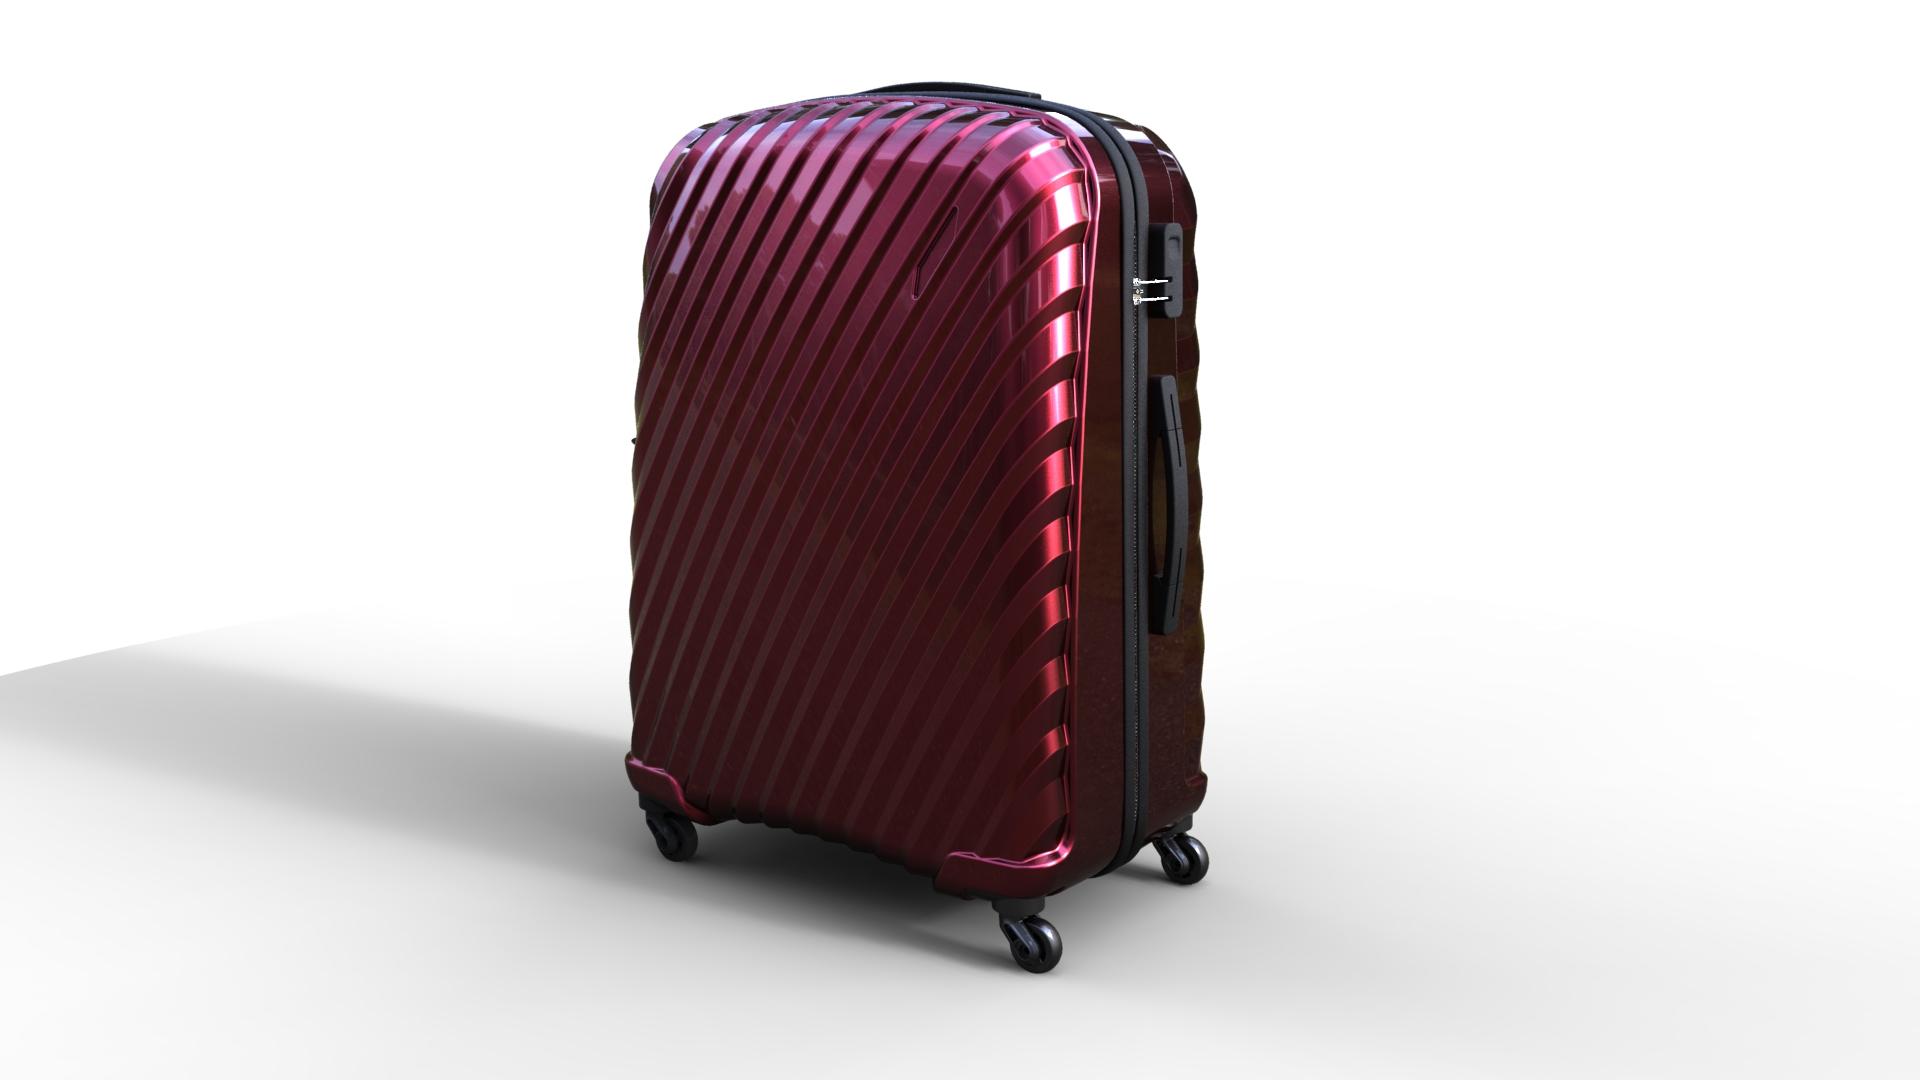 trolley suitcase bag 03 3d model max fbx ma mb obj 285996